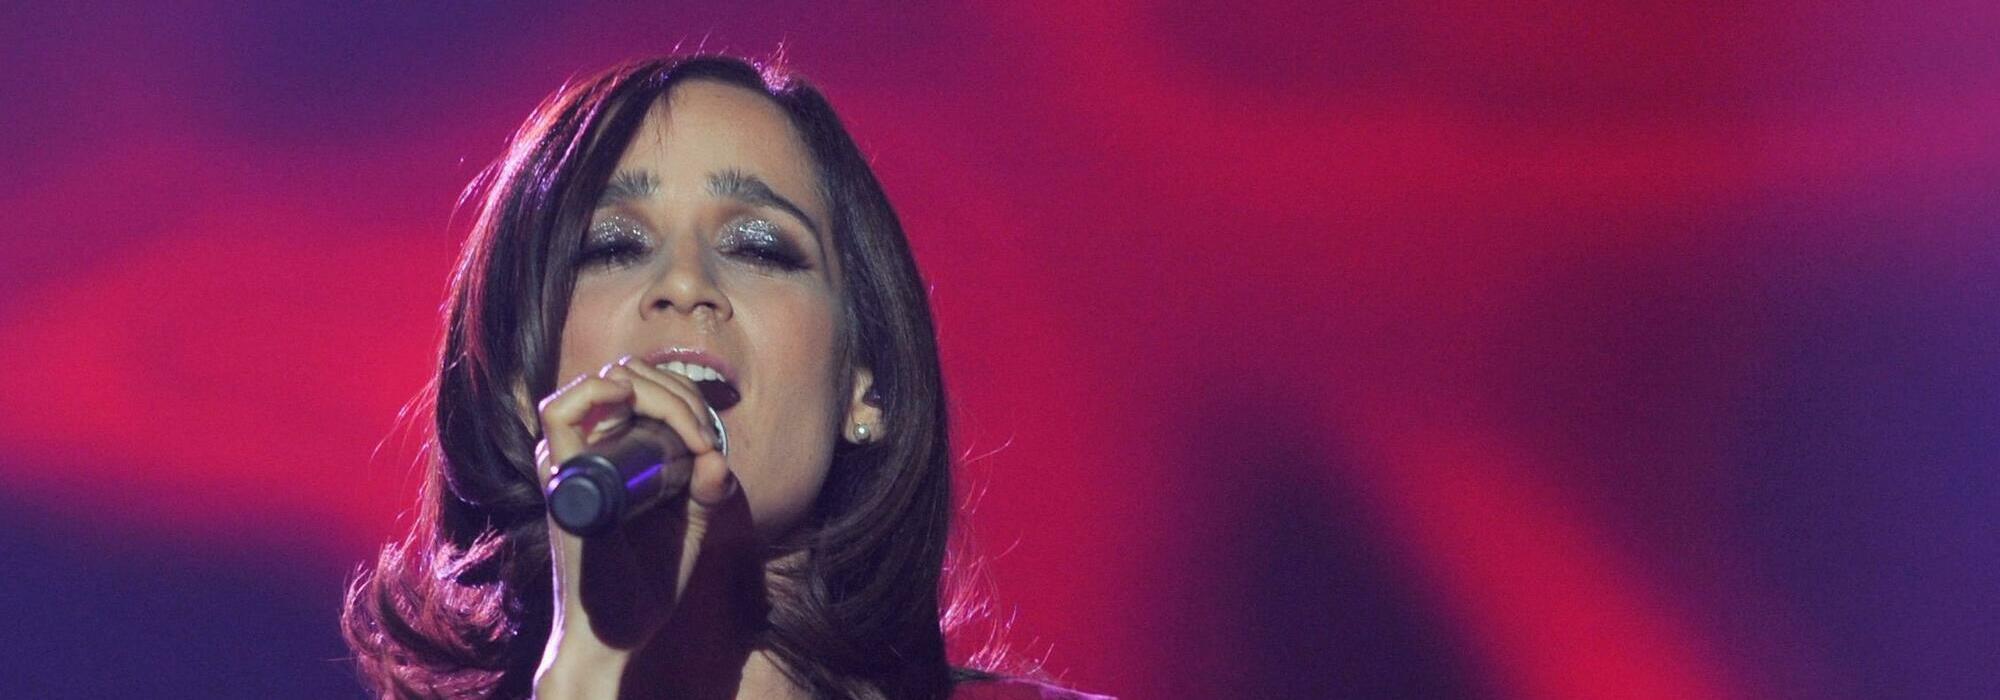 A Julieta Venegas live event